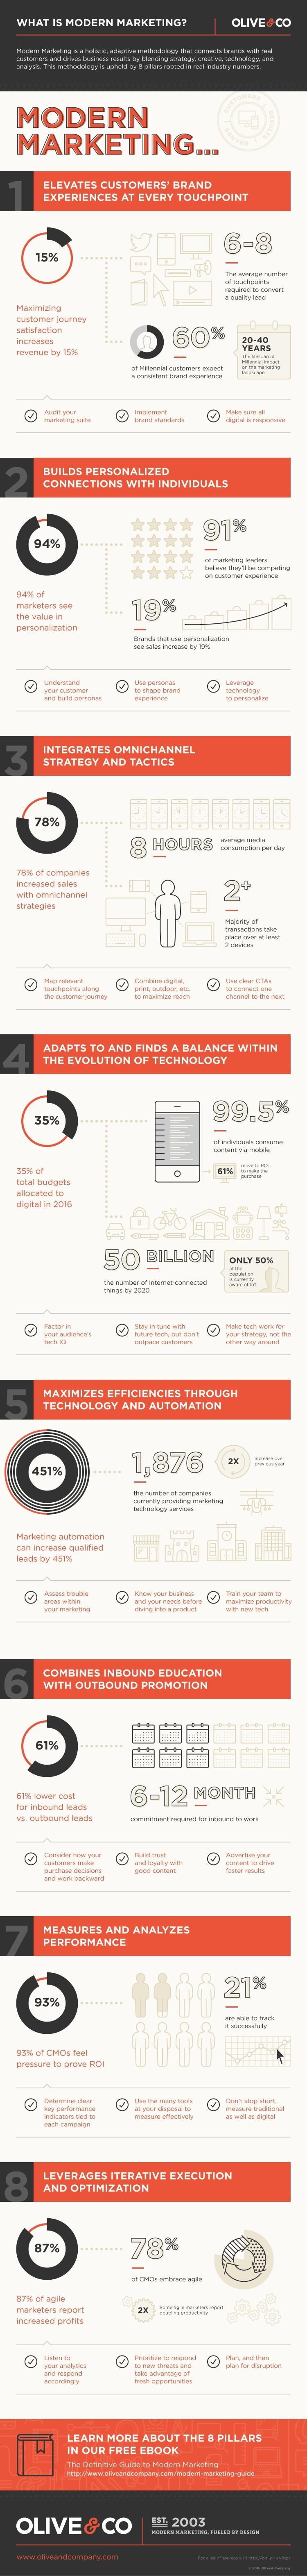 modern-marketing-infographic.jpg